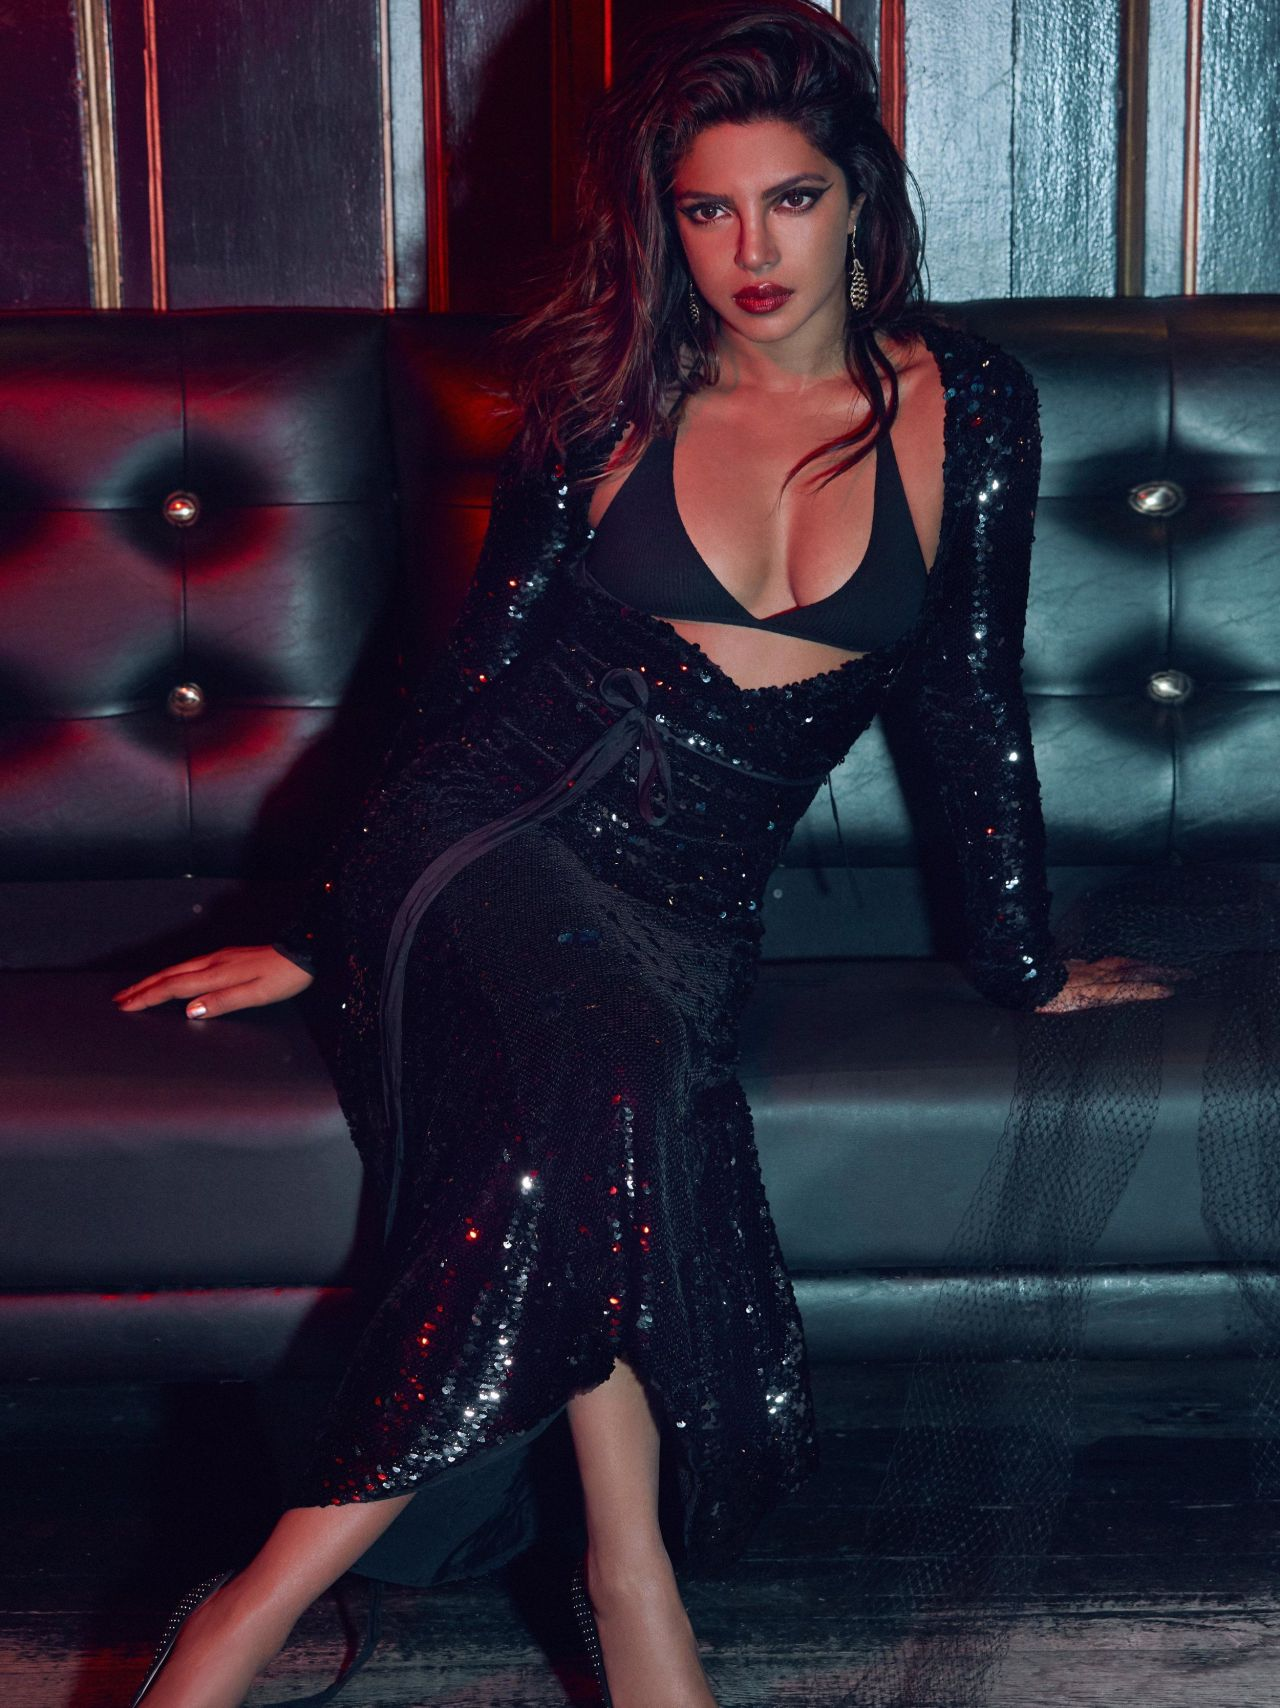 Priyanka Chopra Vogue India September 2017 Issue And Photos